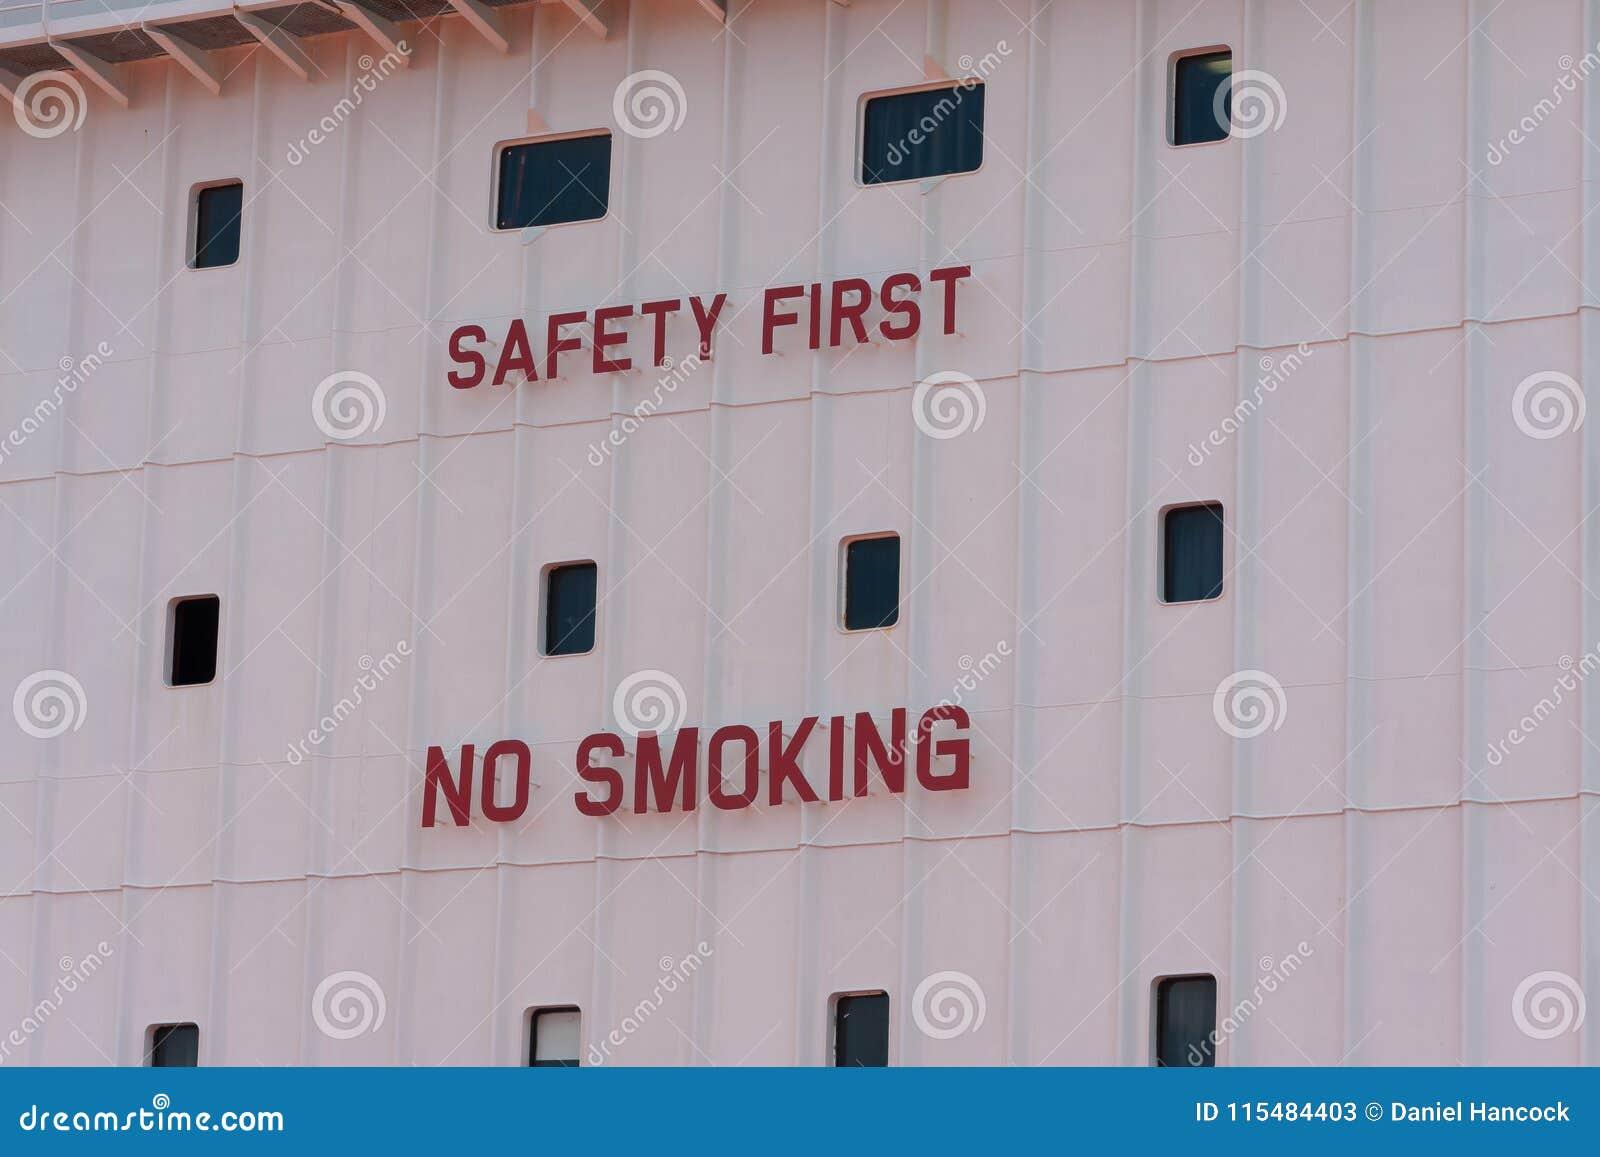 saftey first no smoking sign stock image image of smoking